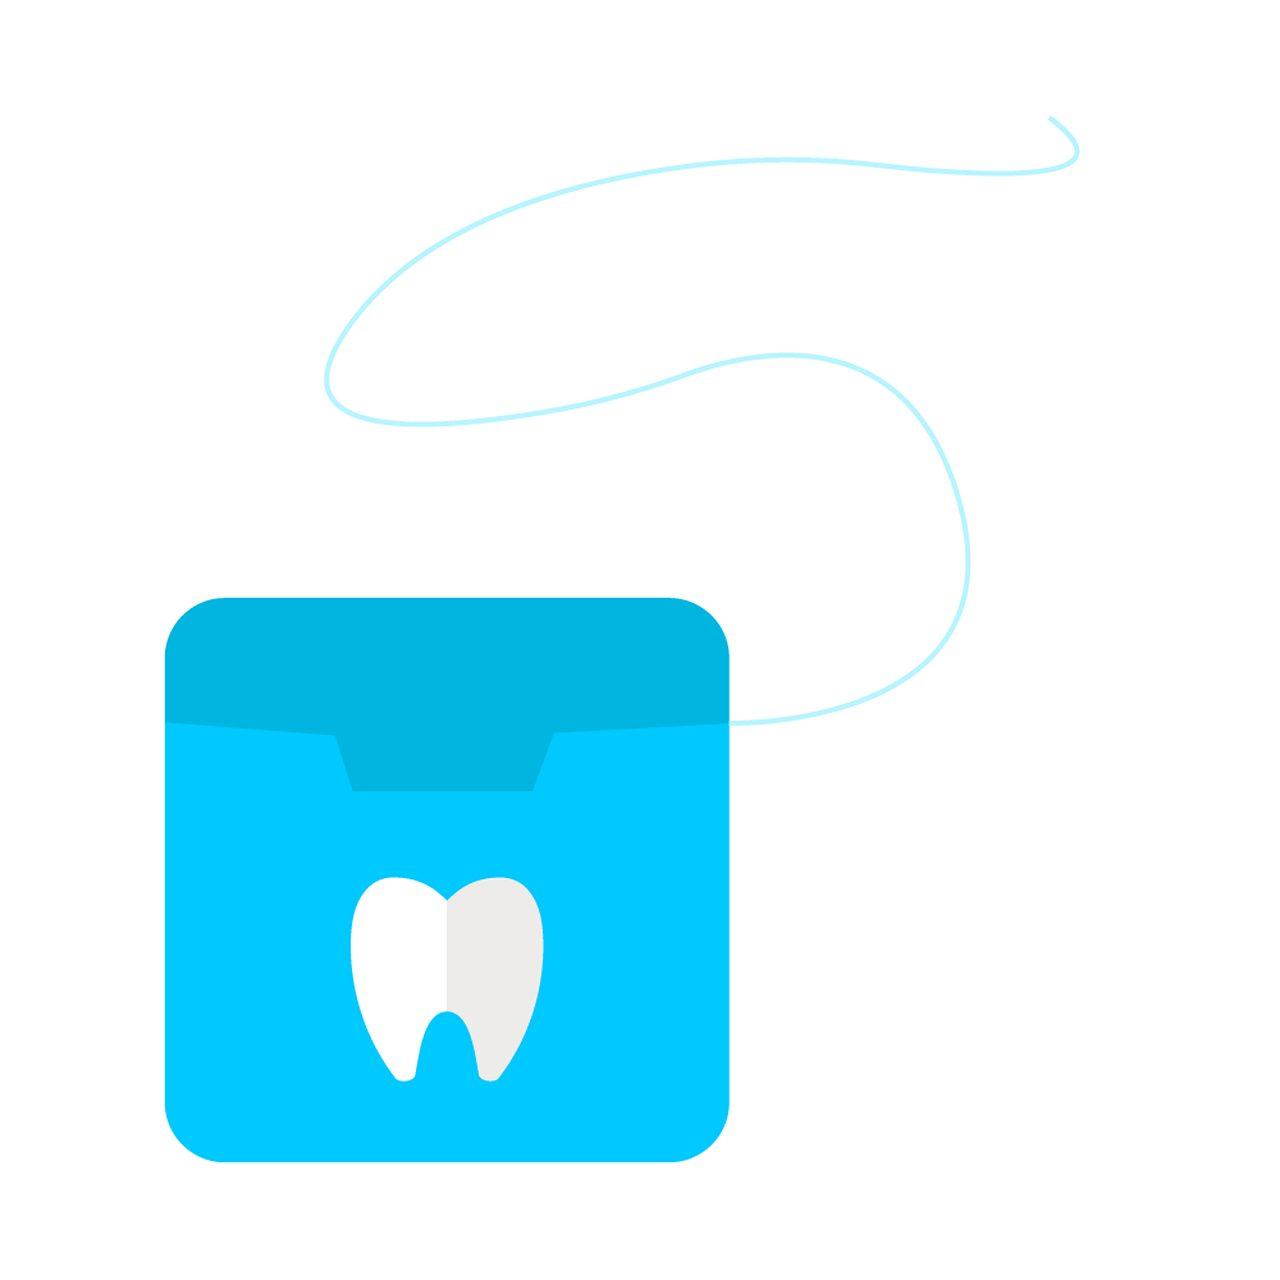 Kroon Tandarts M R A vd spoedhulp tandarts